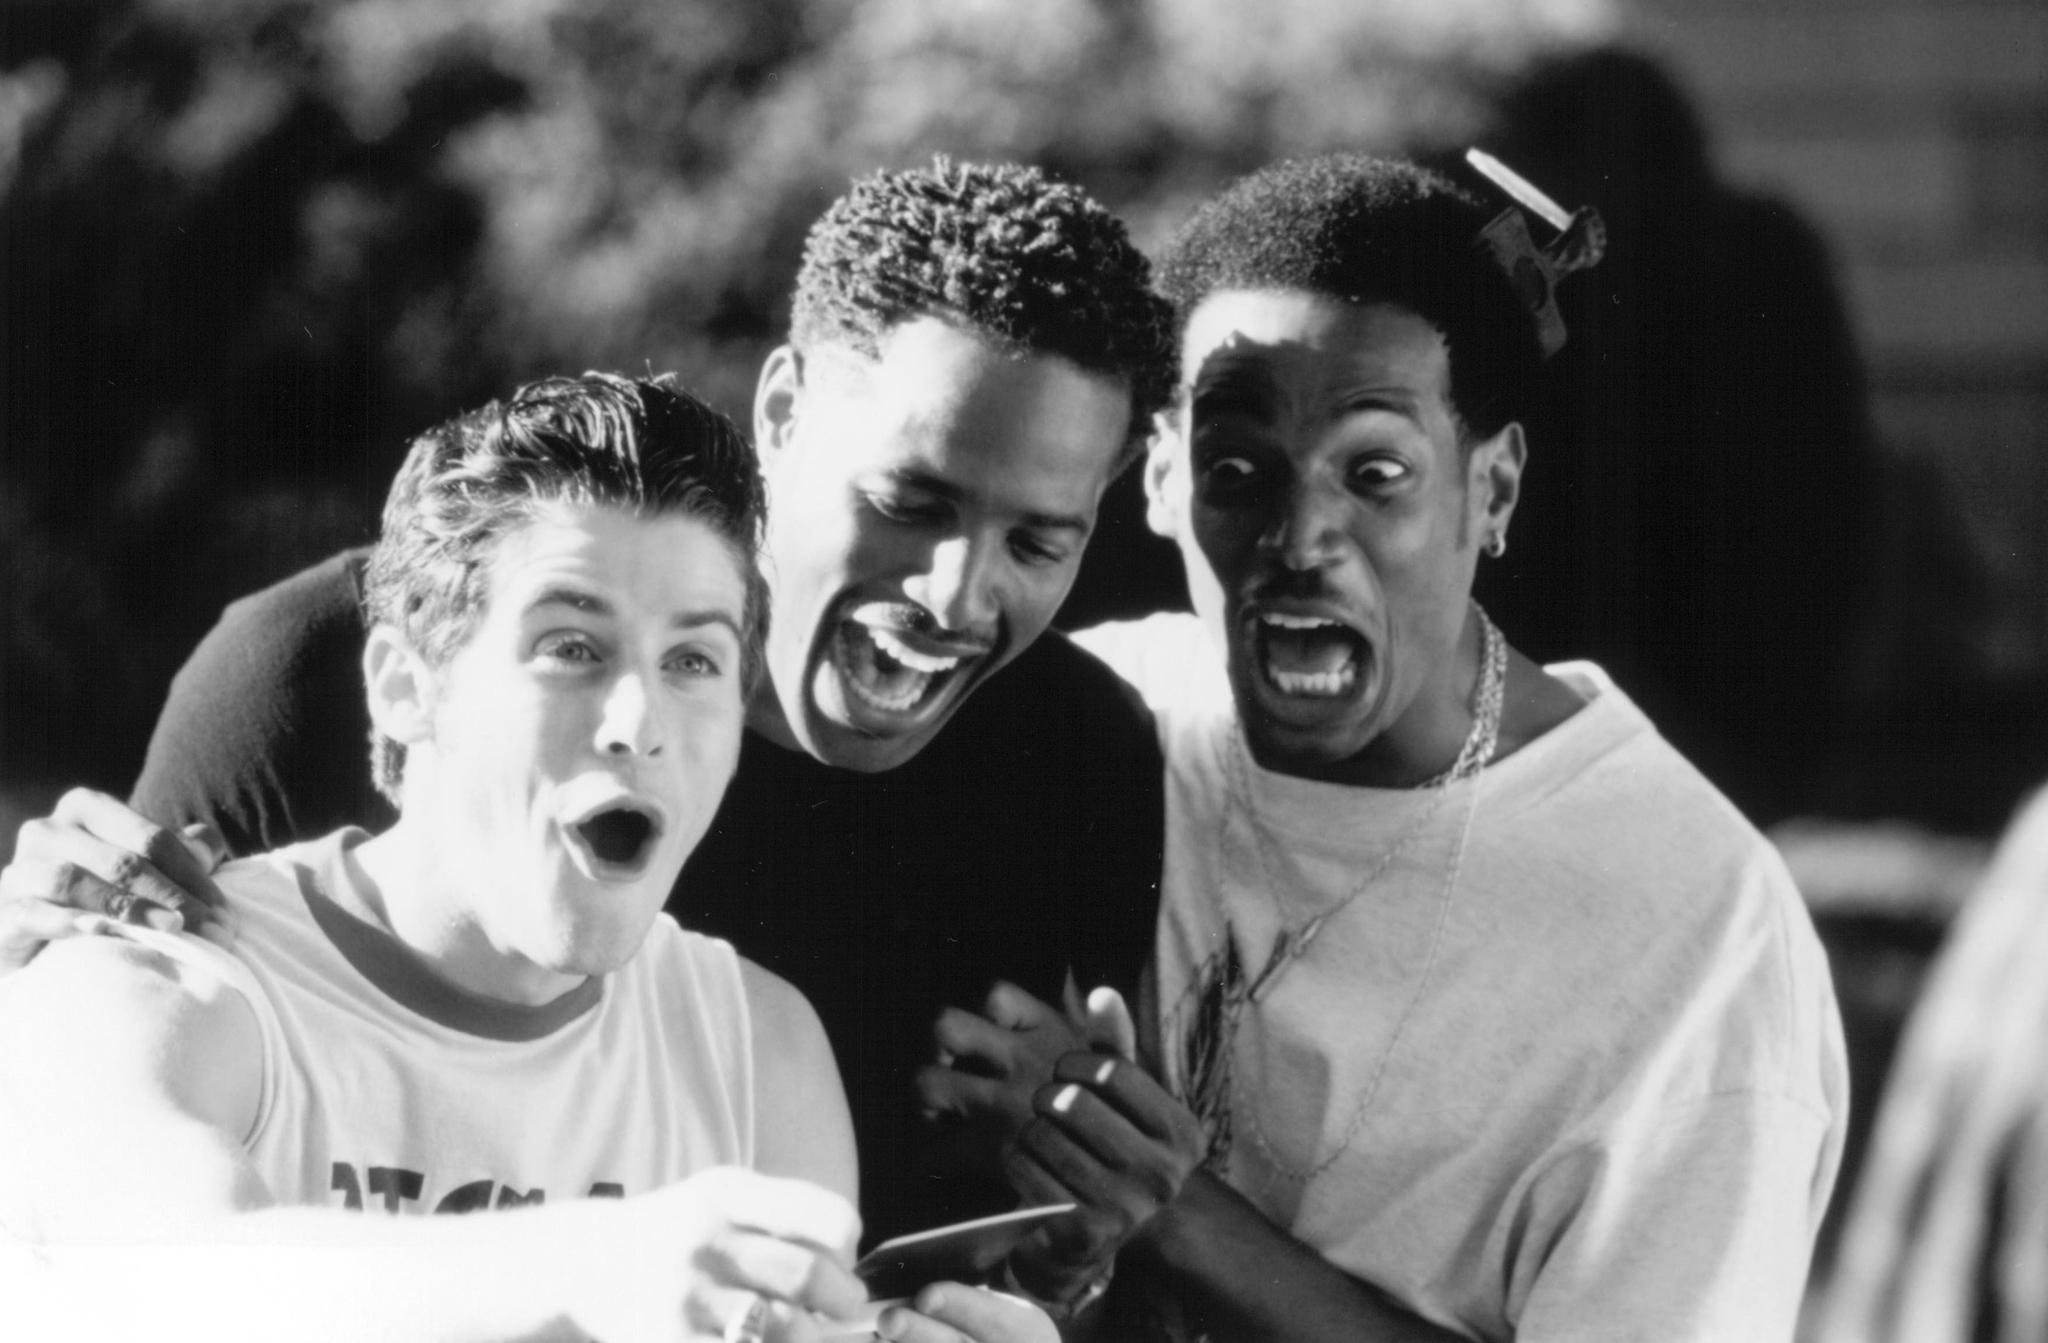 Marlon Wayans, Jon Abrahams, and Shawn Wayans in Scary Movie (2000)